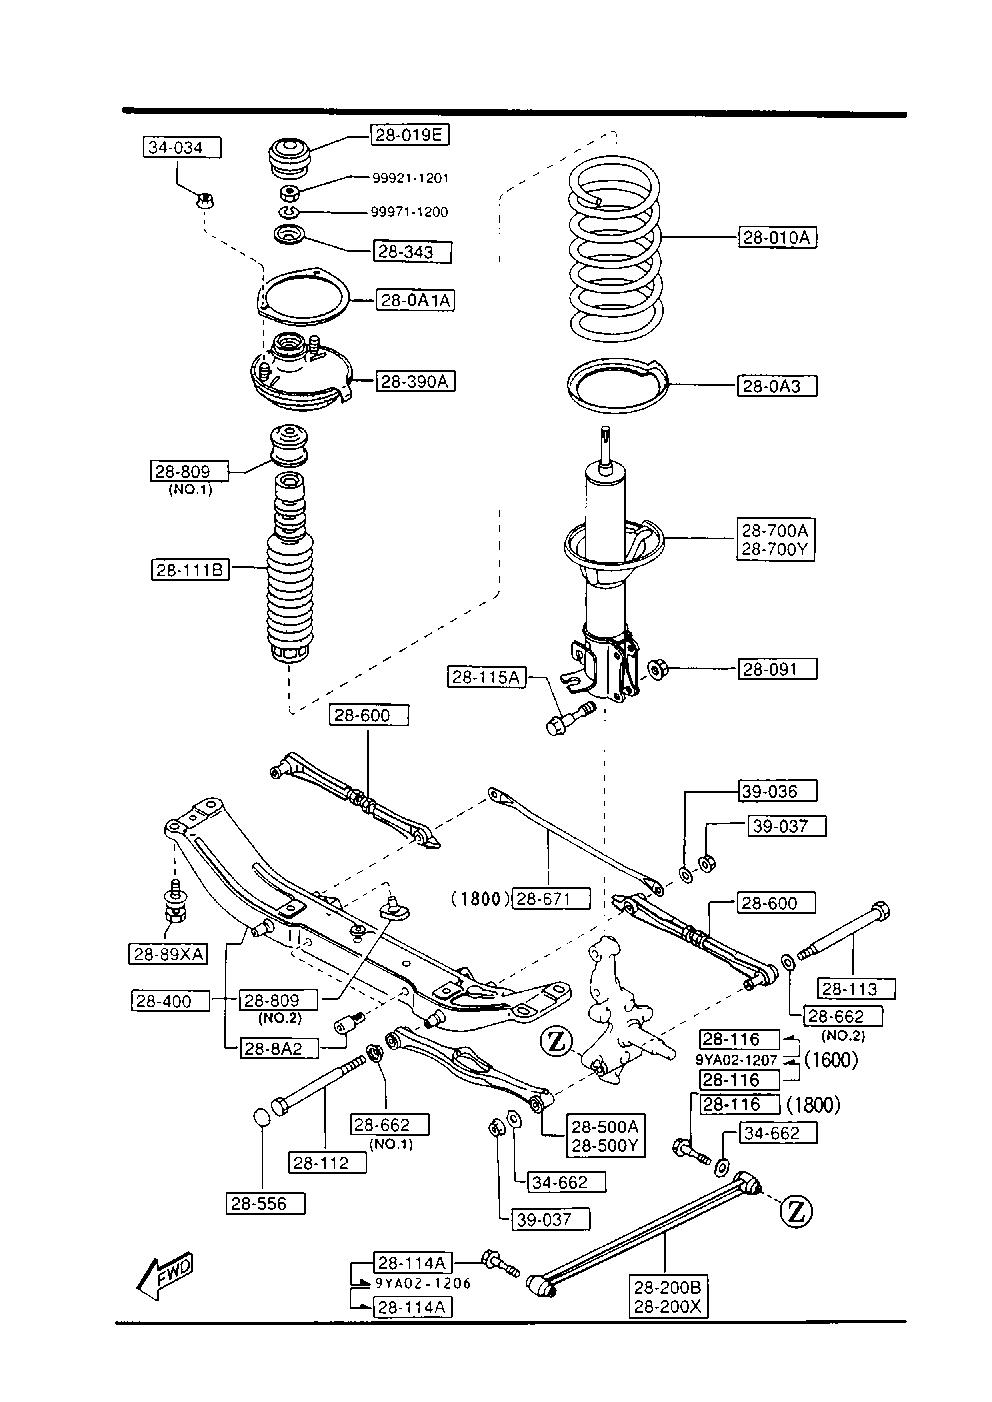 Схема задней подвески мазда 3 2008 года